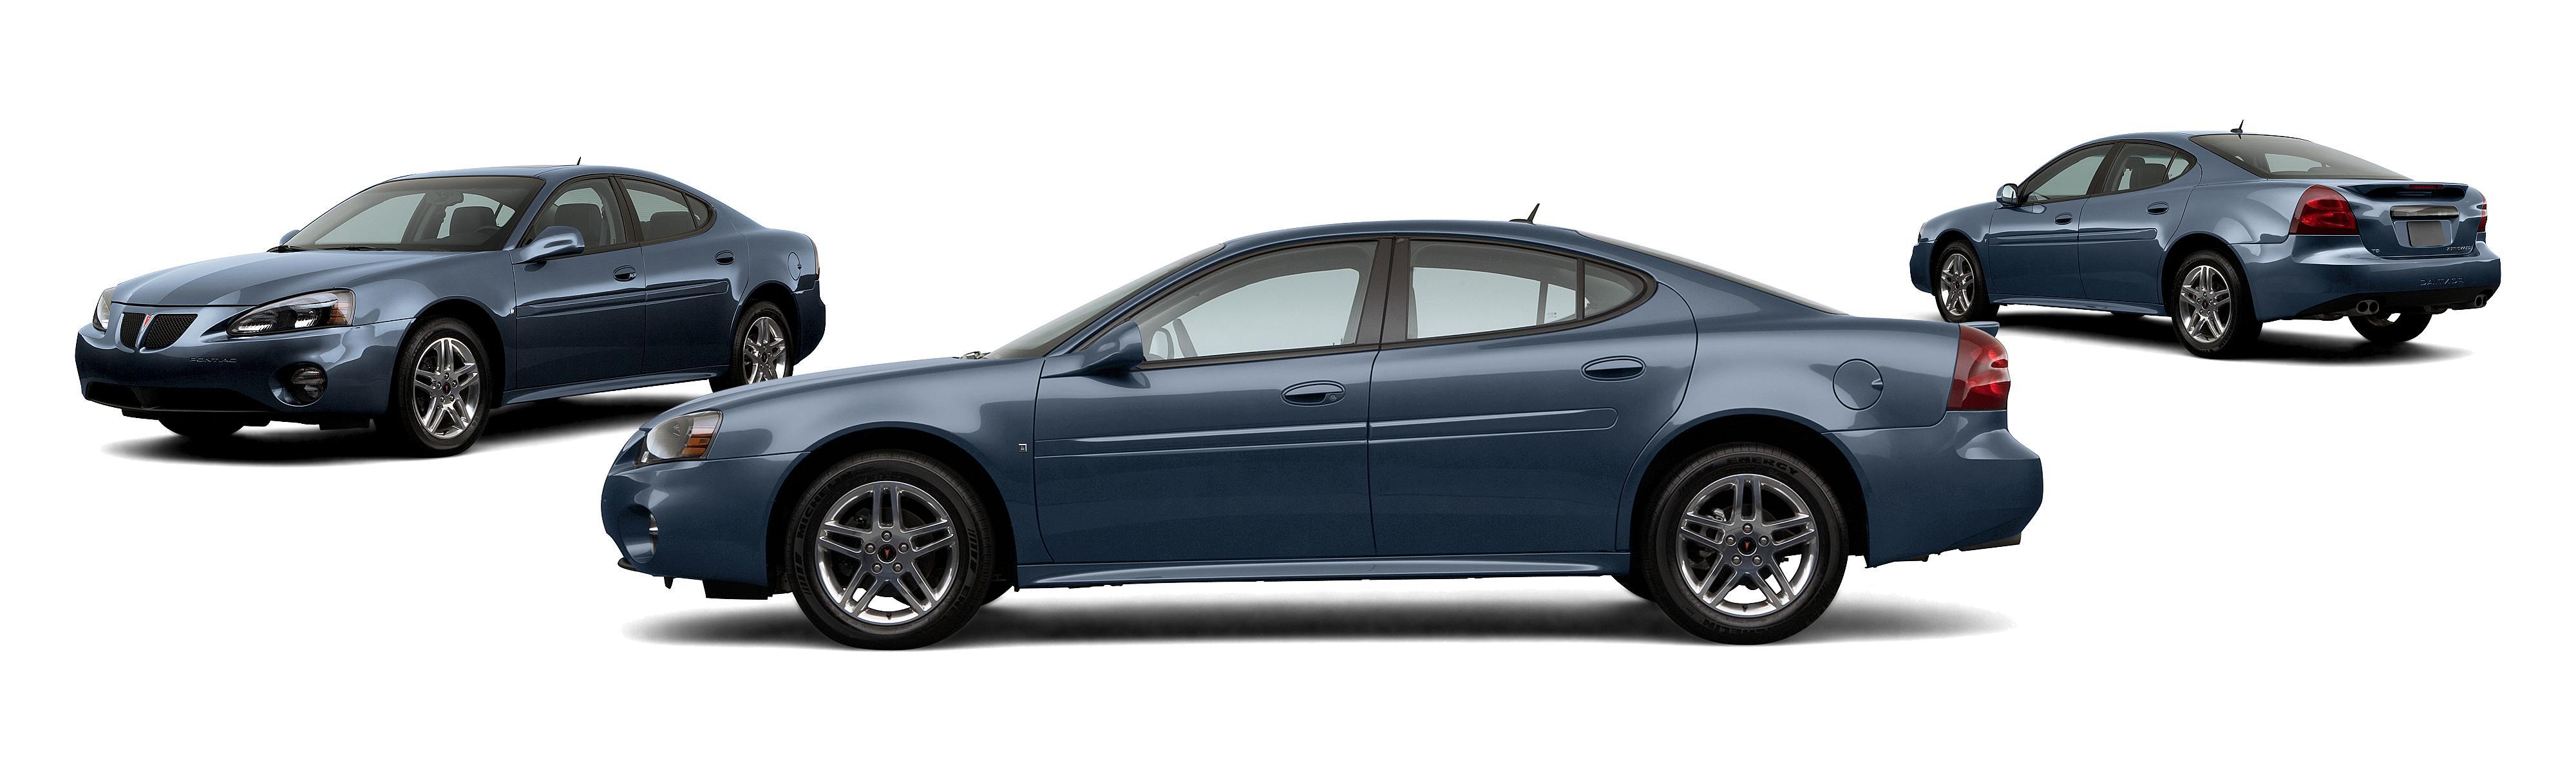 2007 pontiac grand prix gxp 4dr sedan research groovecar rh groovecar com